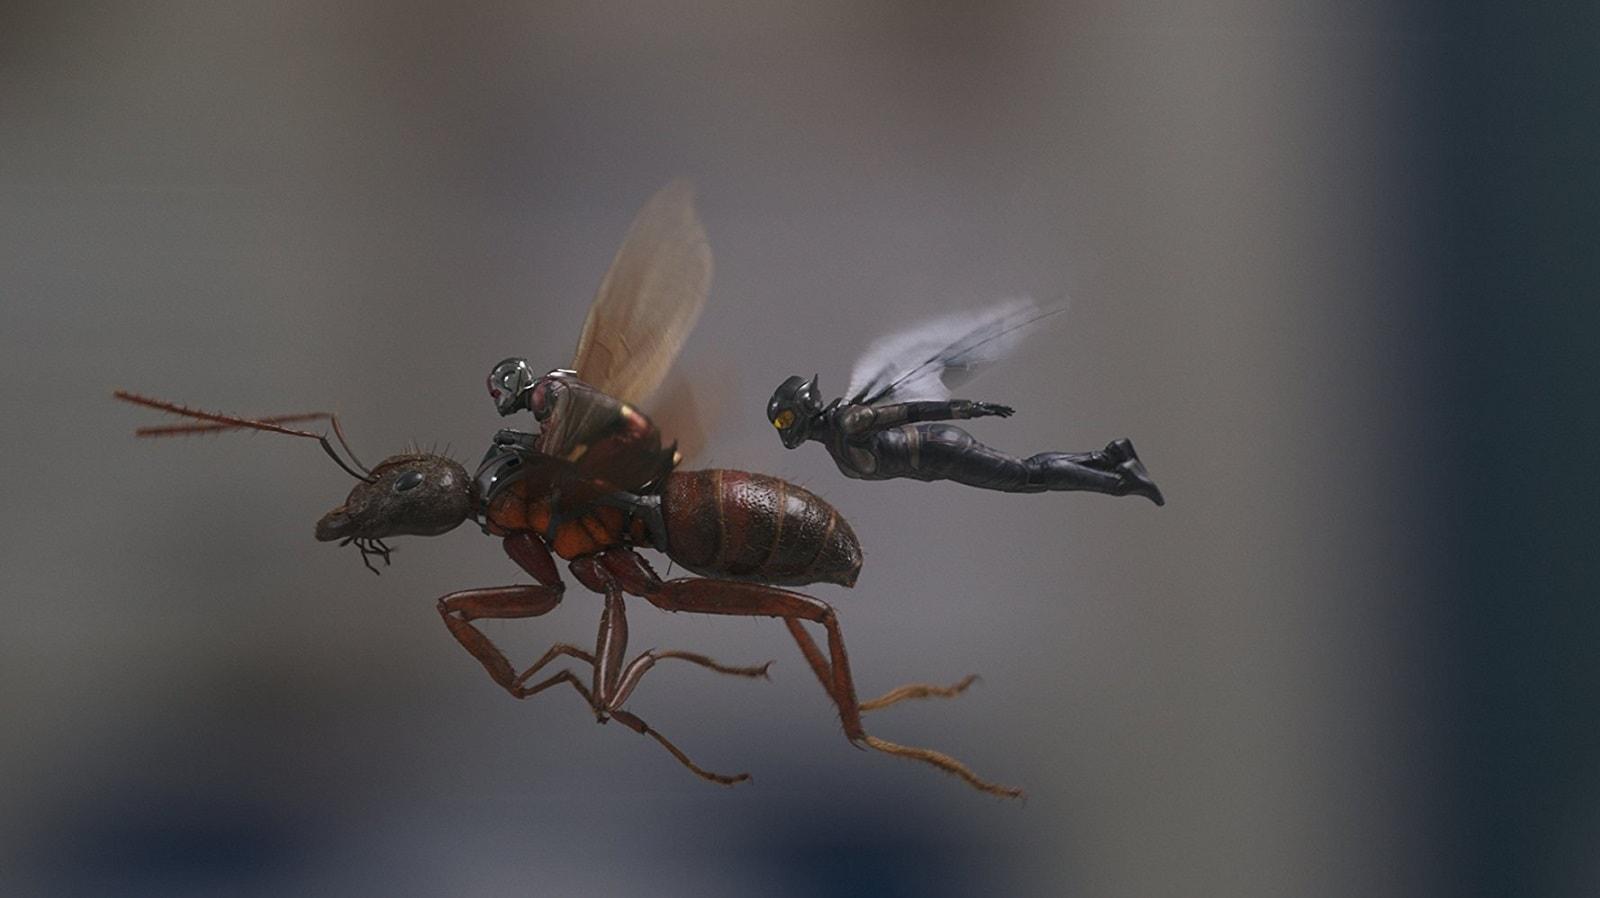 Человек-муравей и Оса, Человек-муравей 2, Фантастика, Рецензия, Обзор, Отзыв, Мнение, Ant-Man and The Wasp, Ant-Man, SciFi, Review, Marvel, MCU